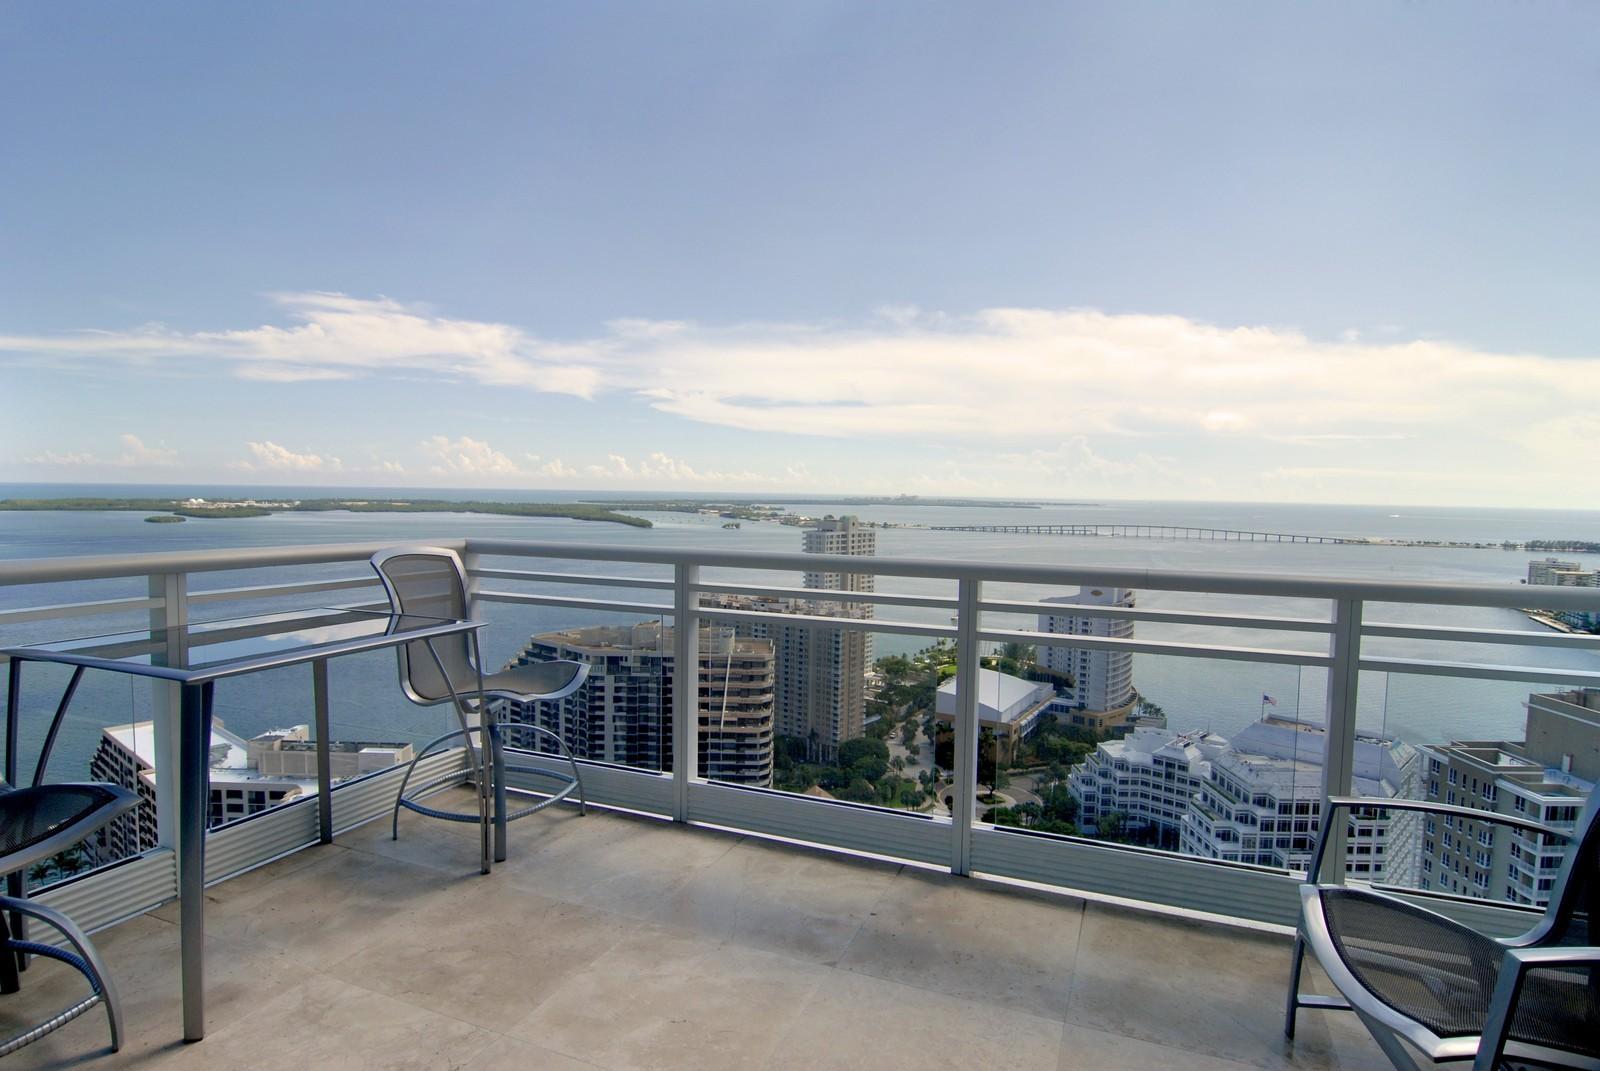 Real Estate Photography - 900 Brickell Key Blvd, Apt 3004, Miami, FL, 33131 - Living Rm balcony